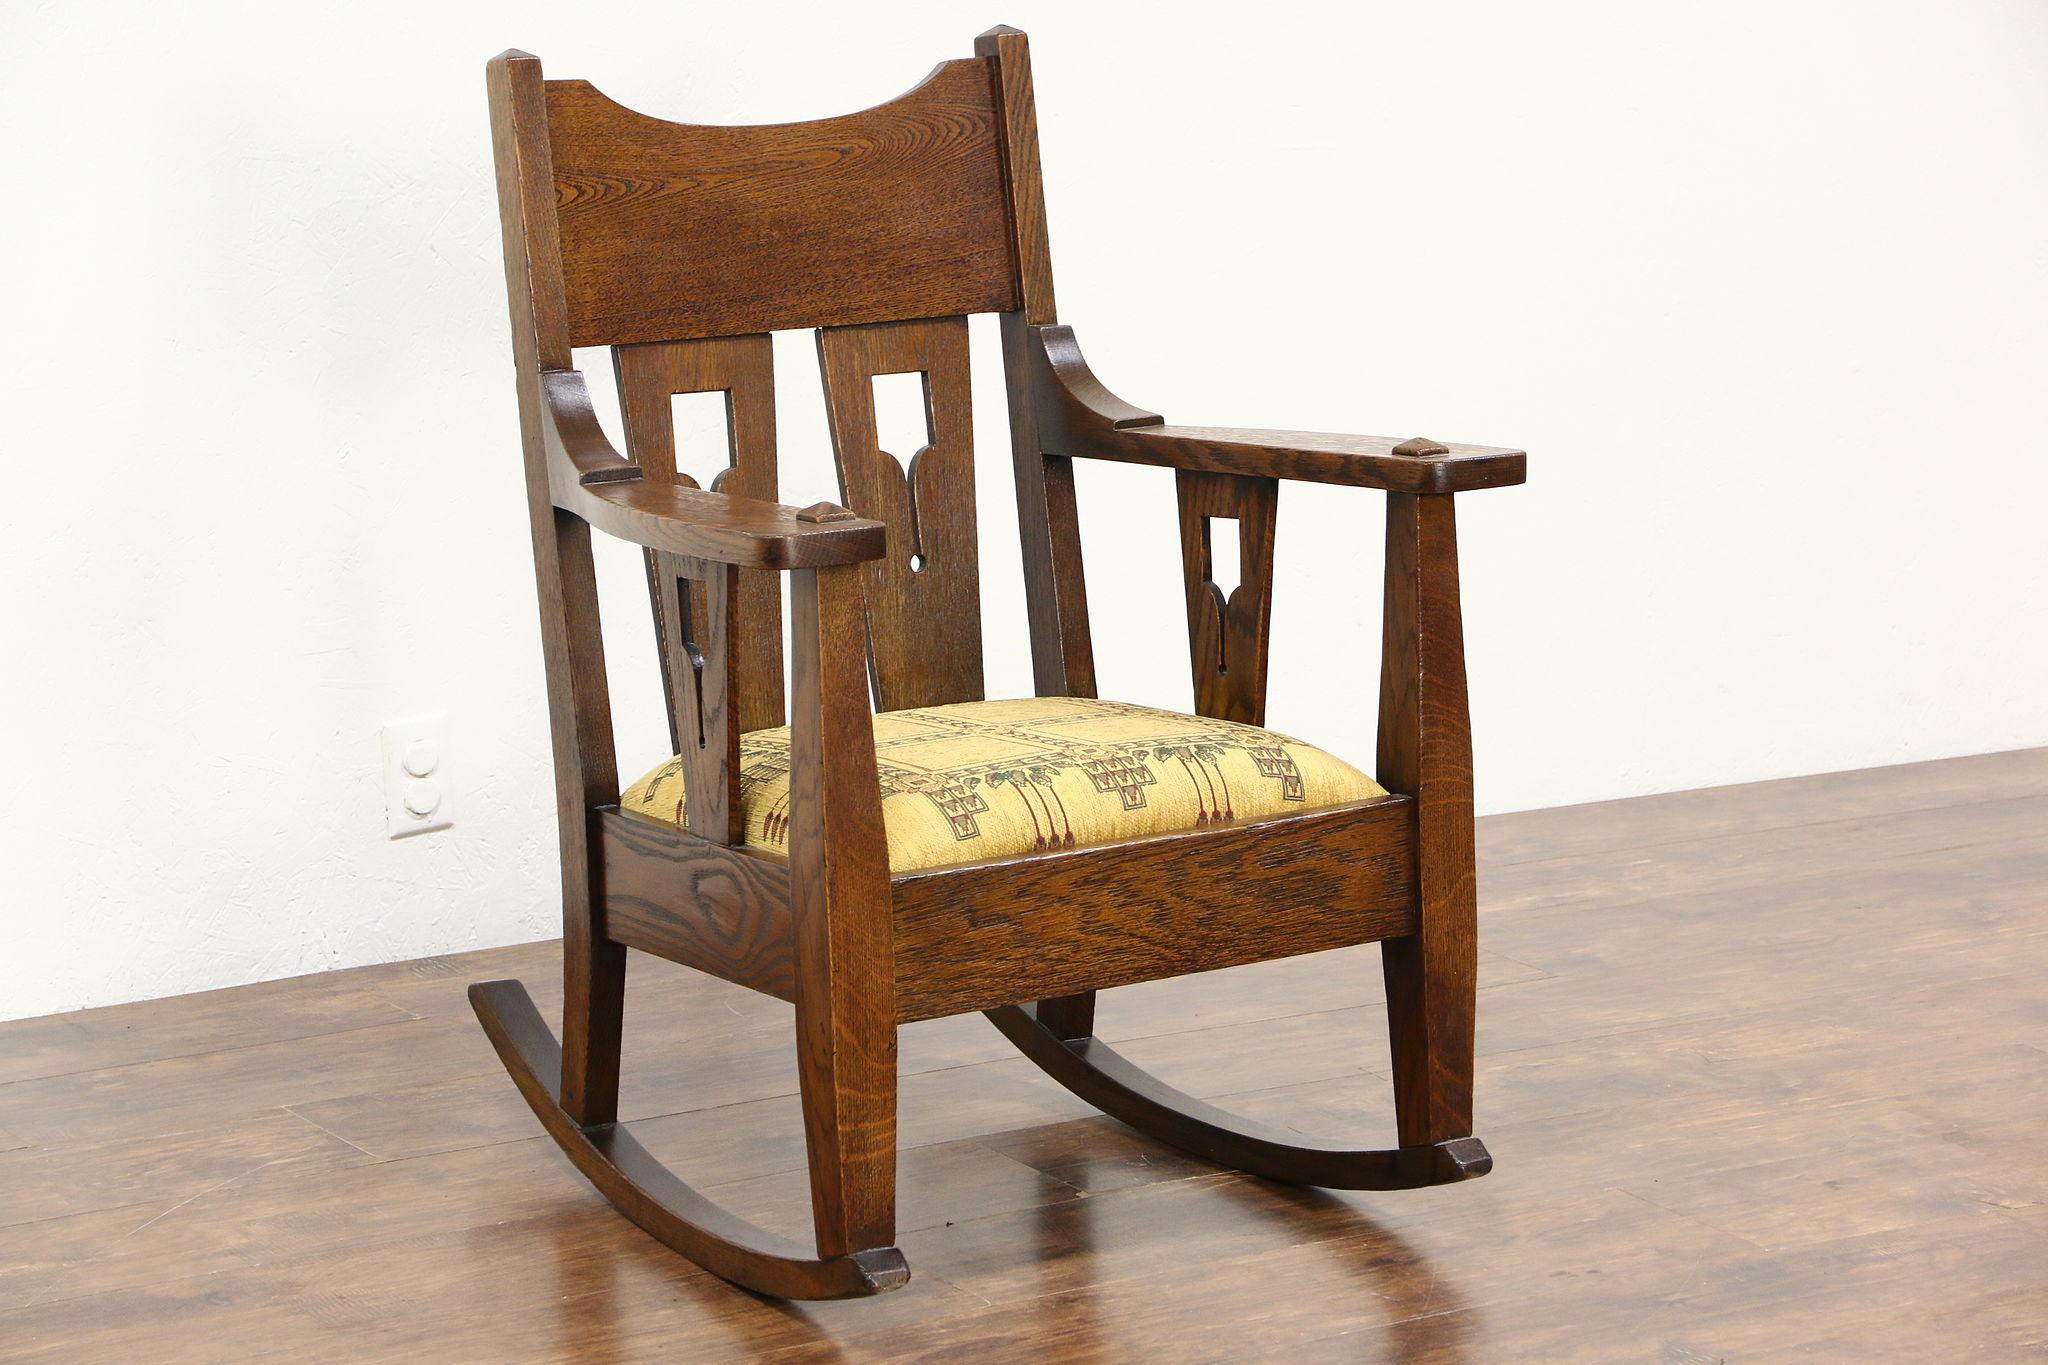 Arts U0026 Crafts Mission Oak Antique Rocker, Craftsman Rocking Chair New  Upholstery ...